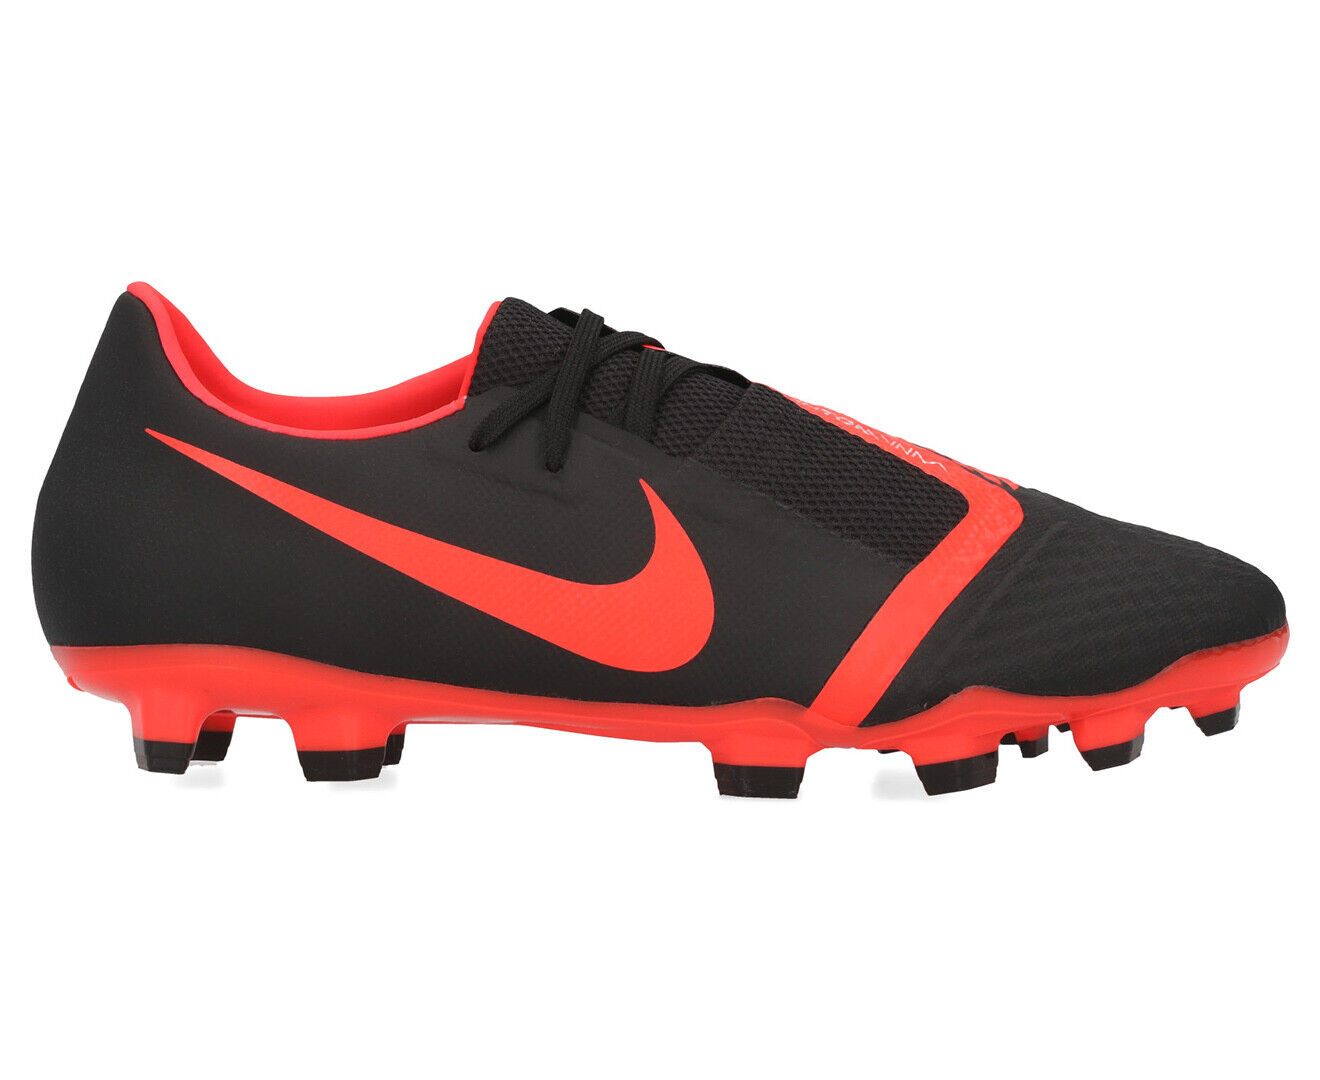 Nike Men's Phantom Venom Academy FG Football Boot BlackBright Crimson AA494